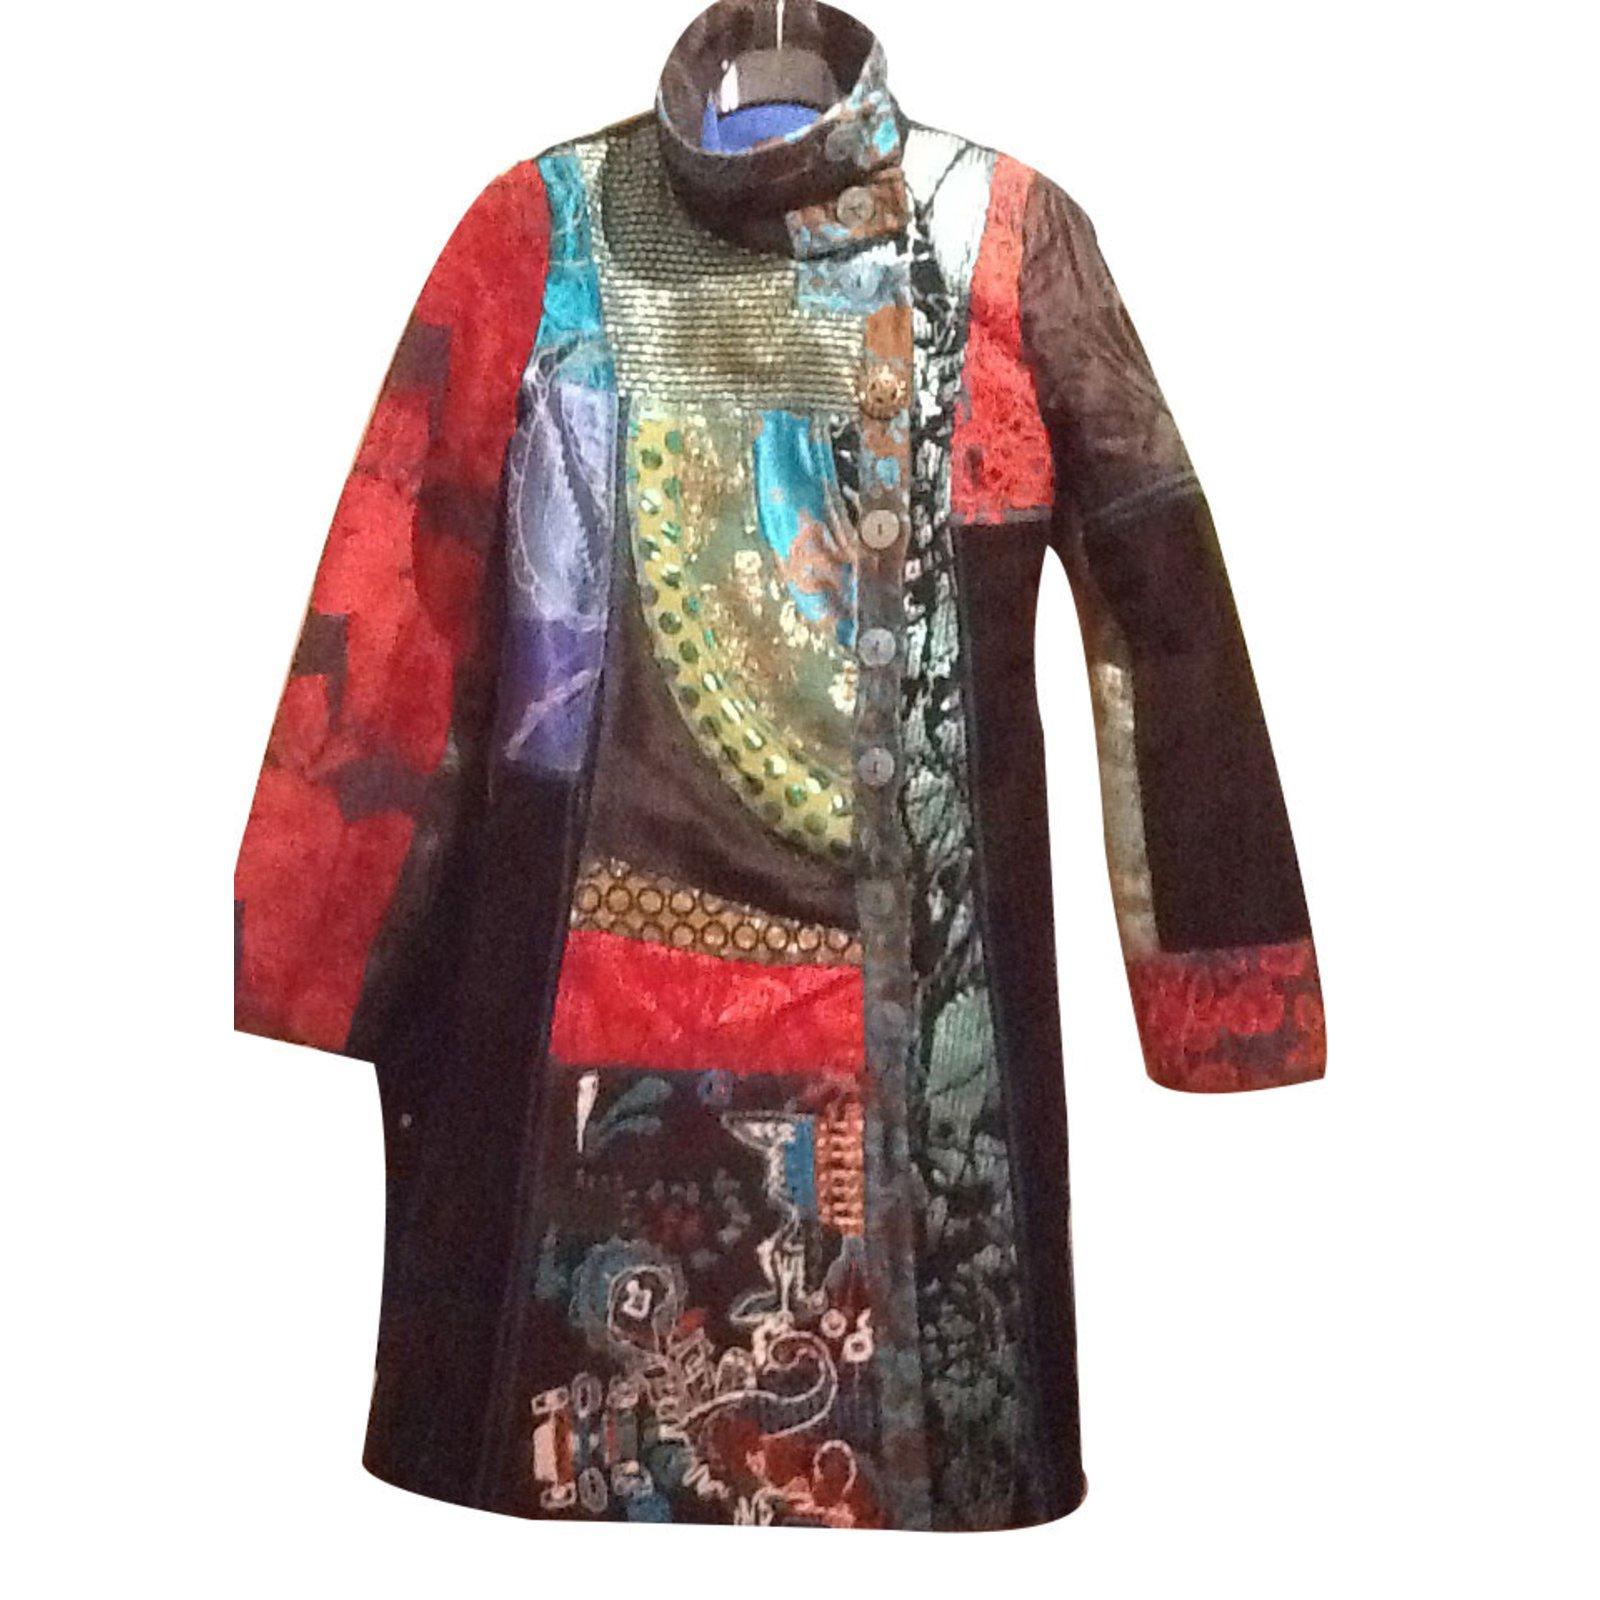 manteaux desigual chic coton multicolore joli closet. Black Bedroom Furniture Sets. Home Design Ideas